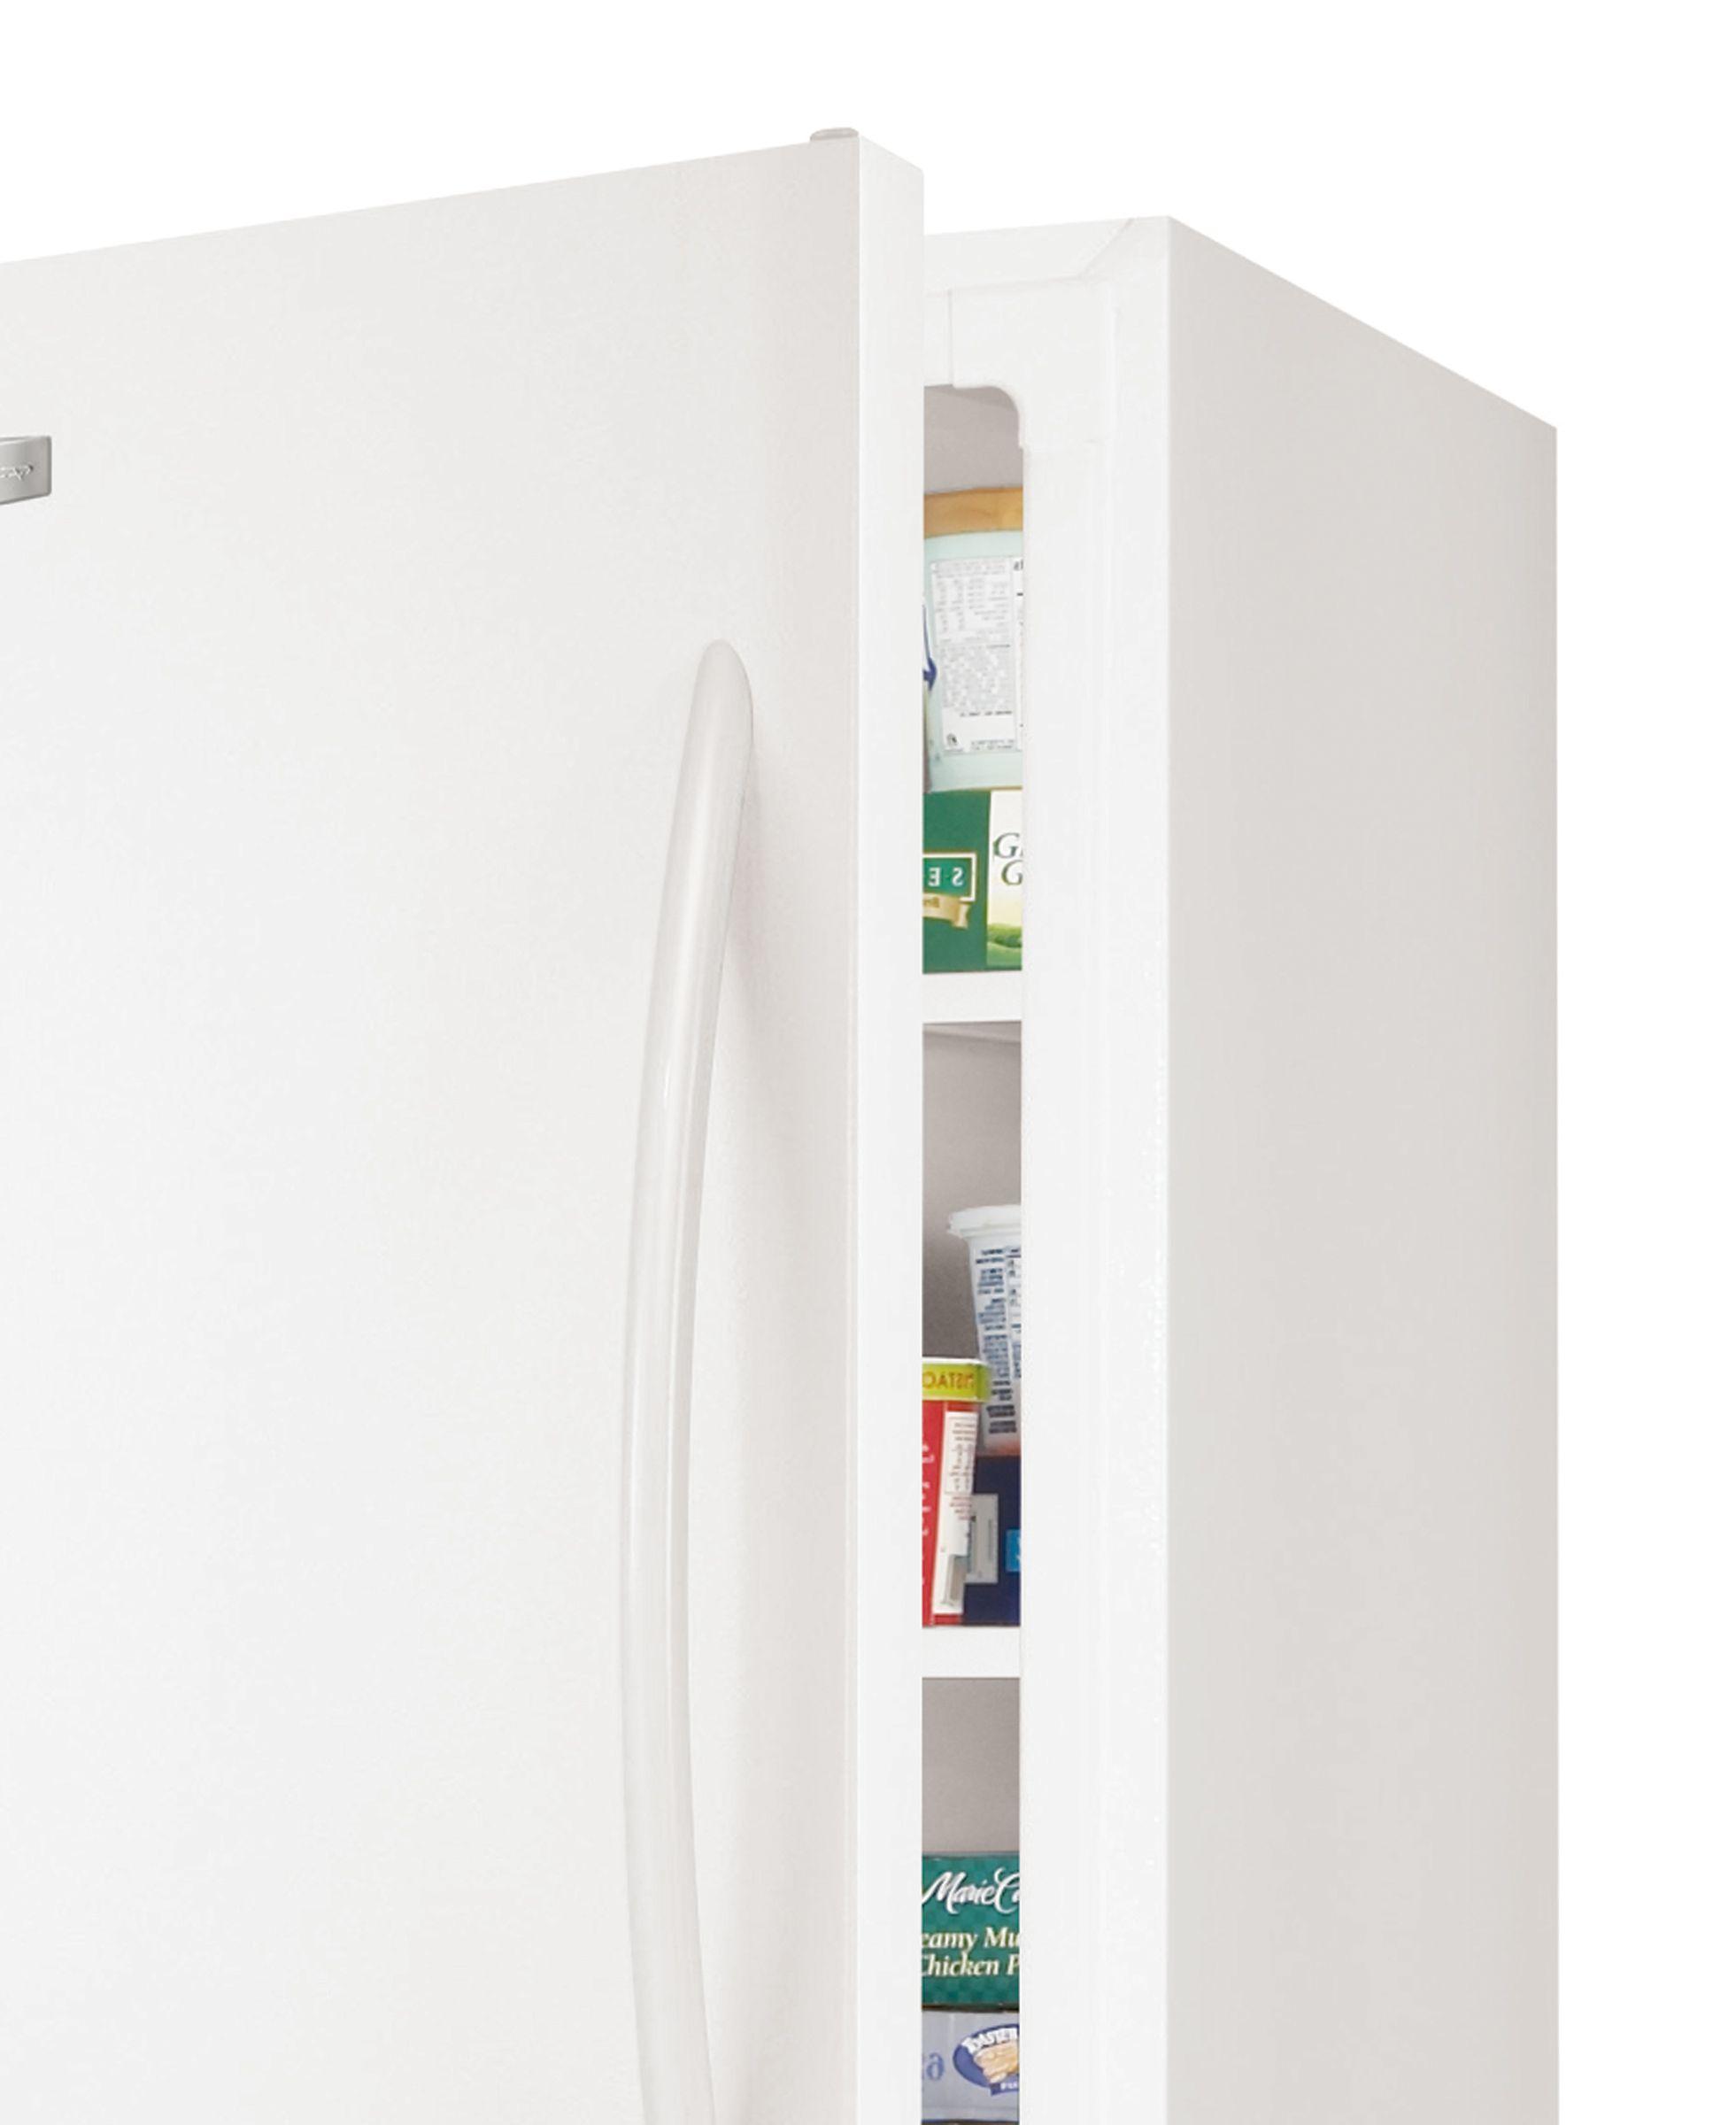 Frigidaire 16.7 cu. ft. Upright Freezer Convertible to All Refrigerator